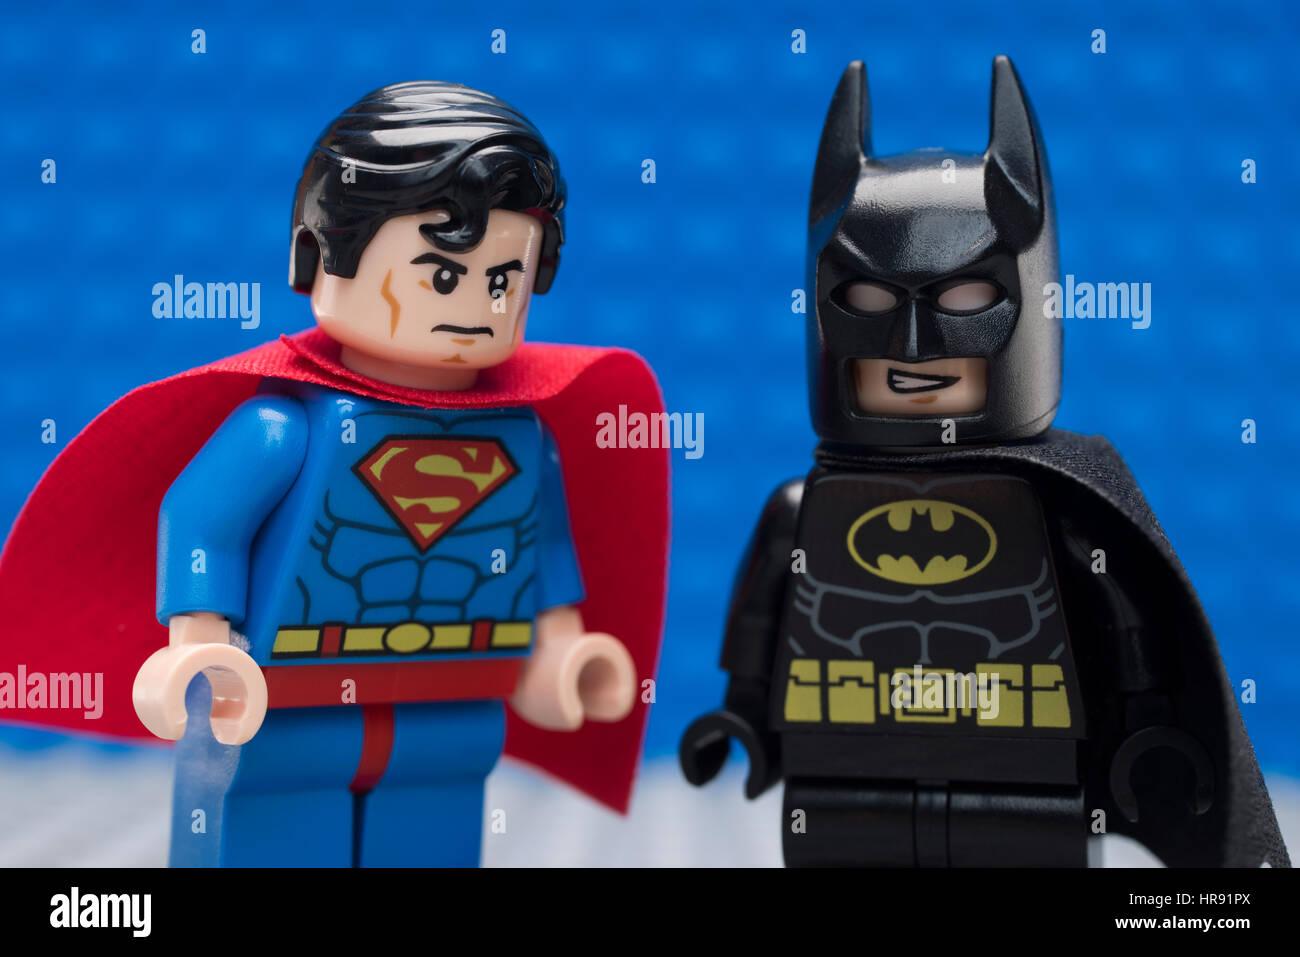 Lampada Lego Batman : Playmobil polizei hafen lego land stockfotos and lego land bilder